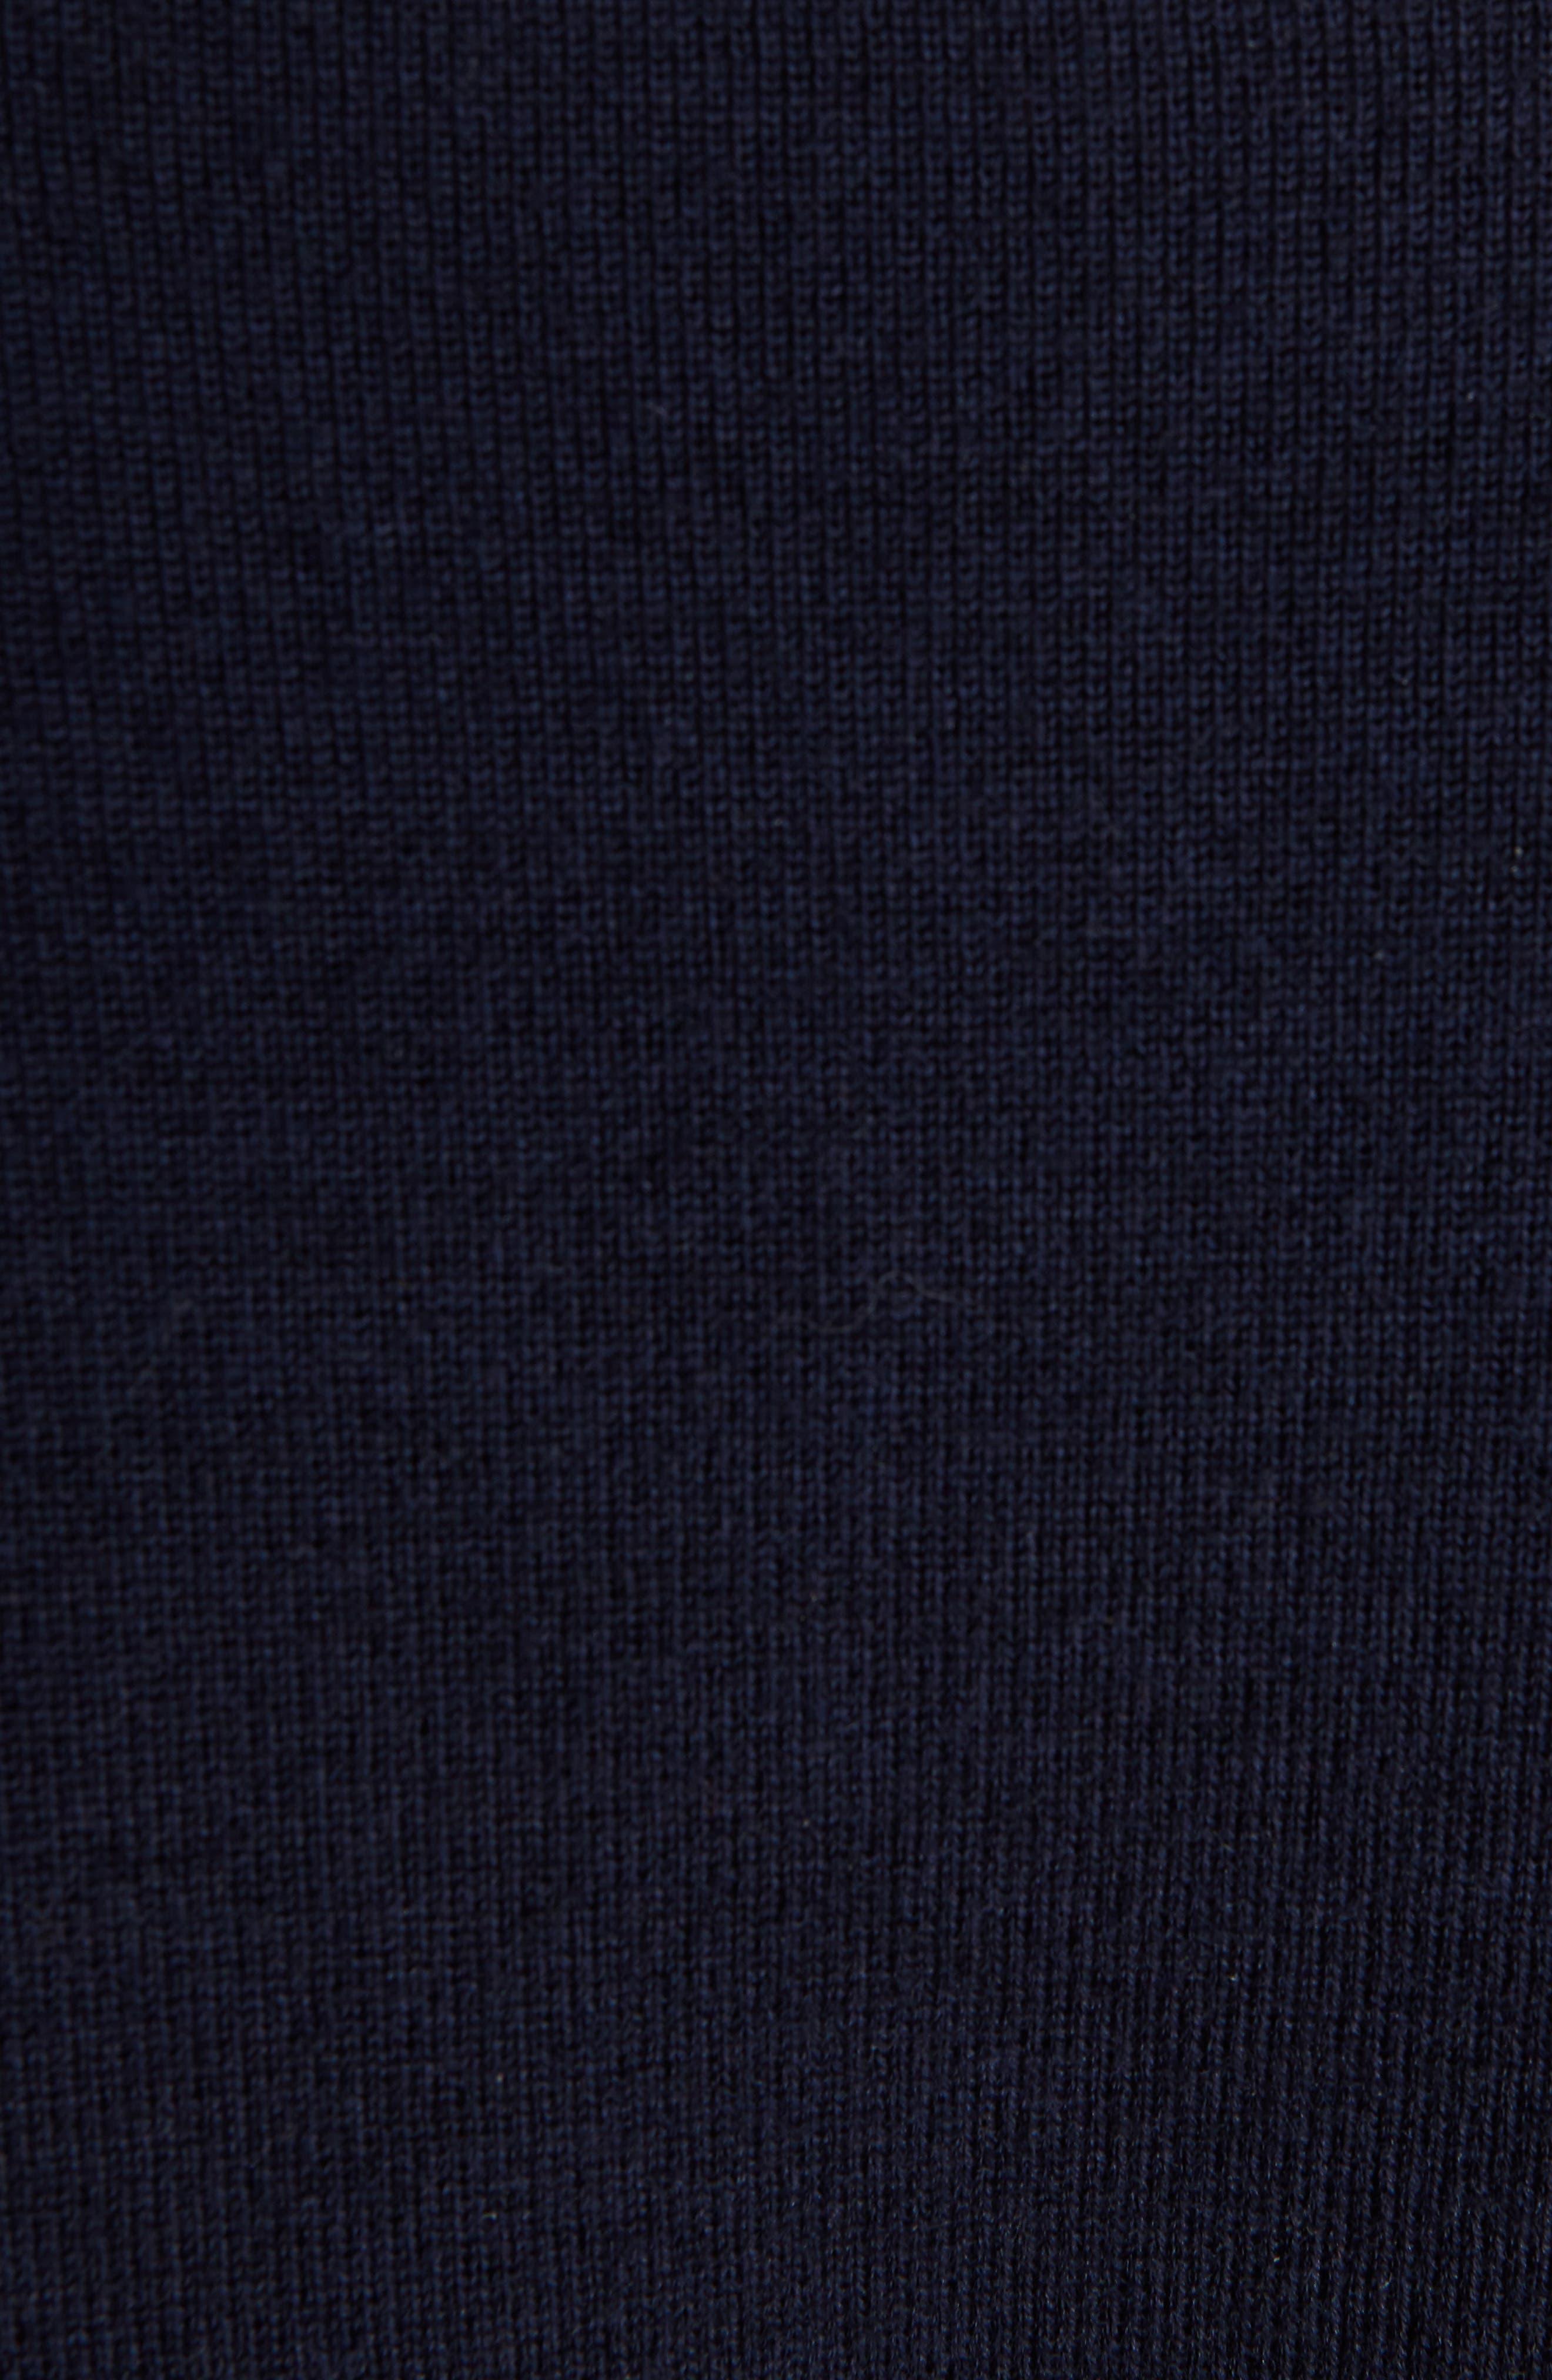 Alternate Image 3  - Loewe Stripe Knit Turtleneck